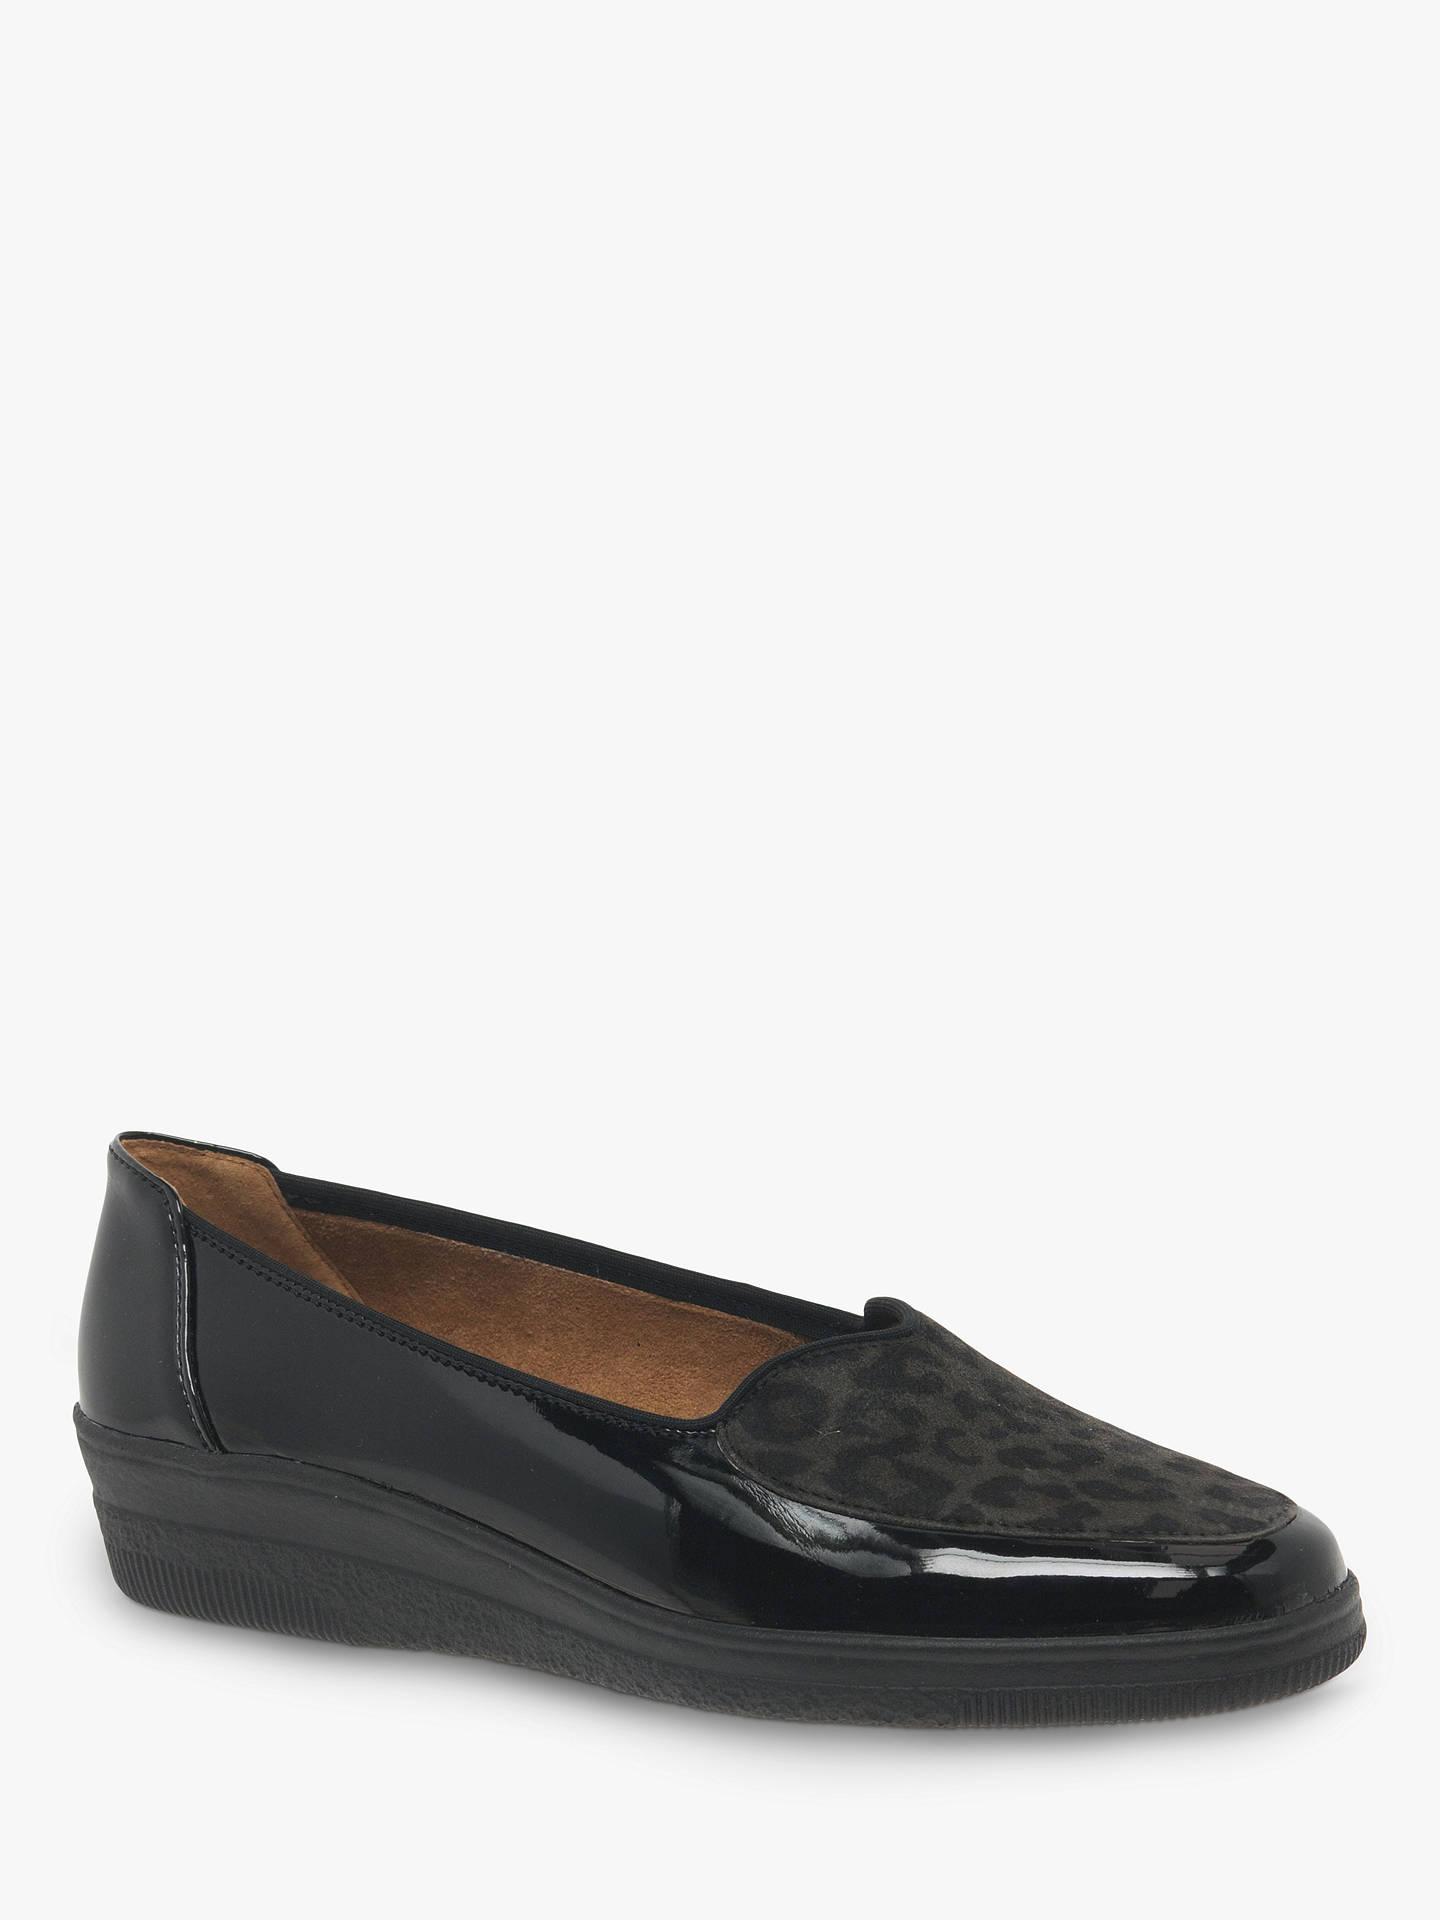 d2014bf3f843 ... Buy Gabor Blanche Wide Fit Patent Leopard Print Ballet Pumps, Black, 3  Online at ...